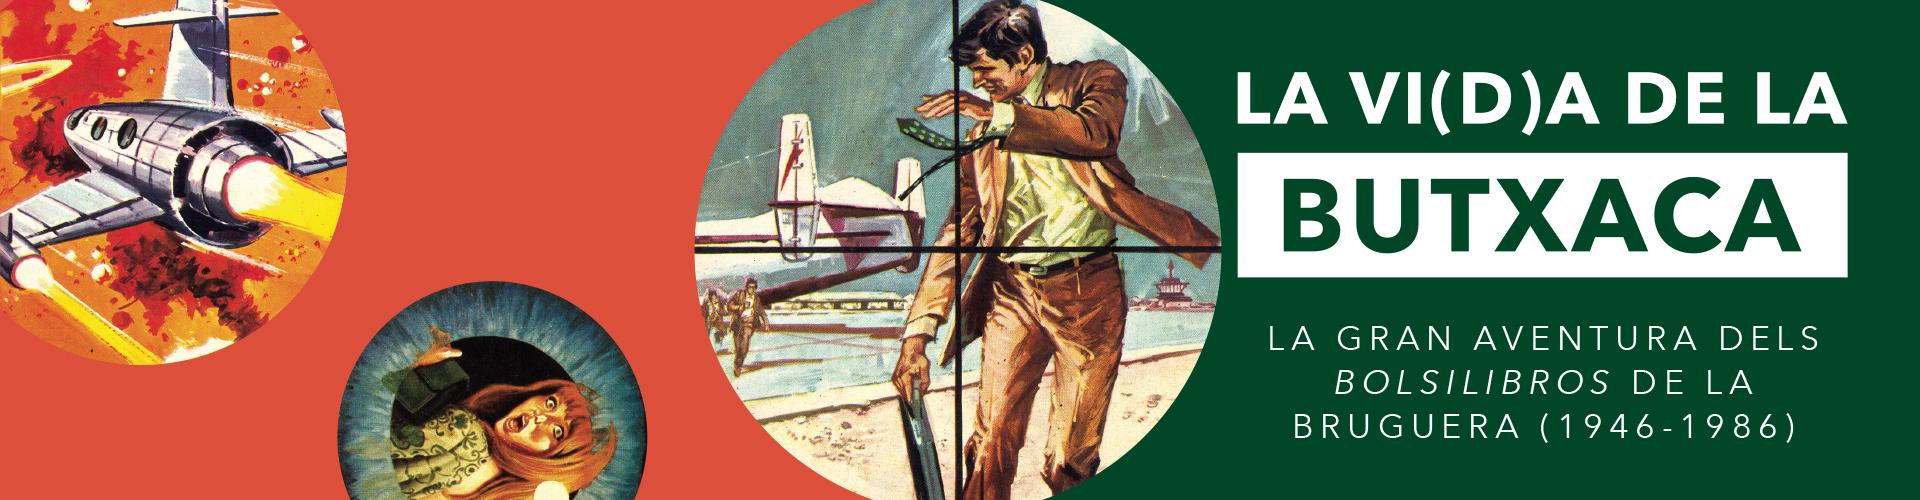 """EXPOSICIONS: La vi(d)a de la butxaca. La gran aventura dels 'bolsilibros' de la Bruguera (1946-1986)"""